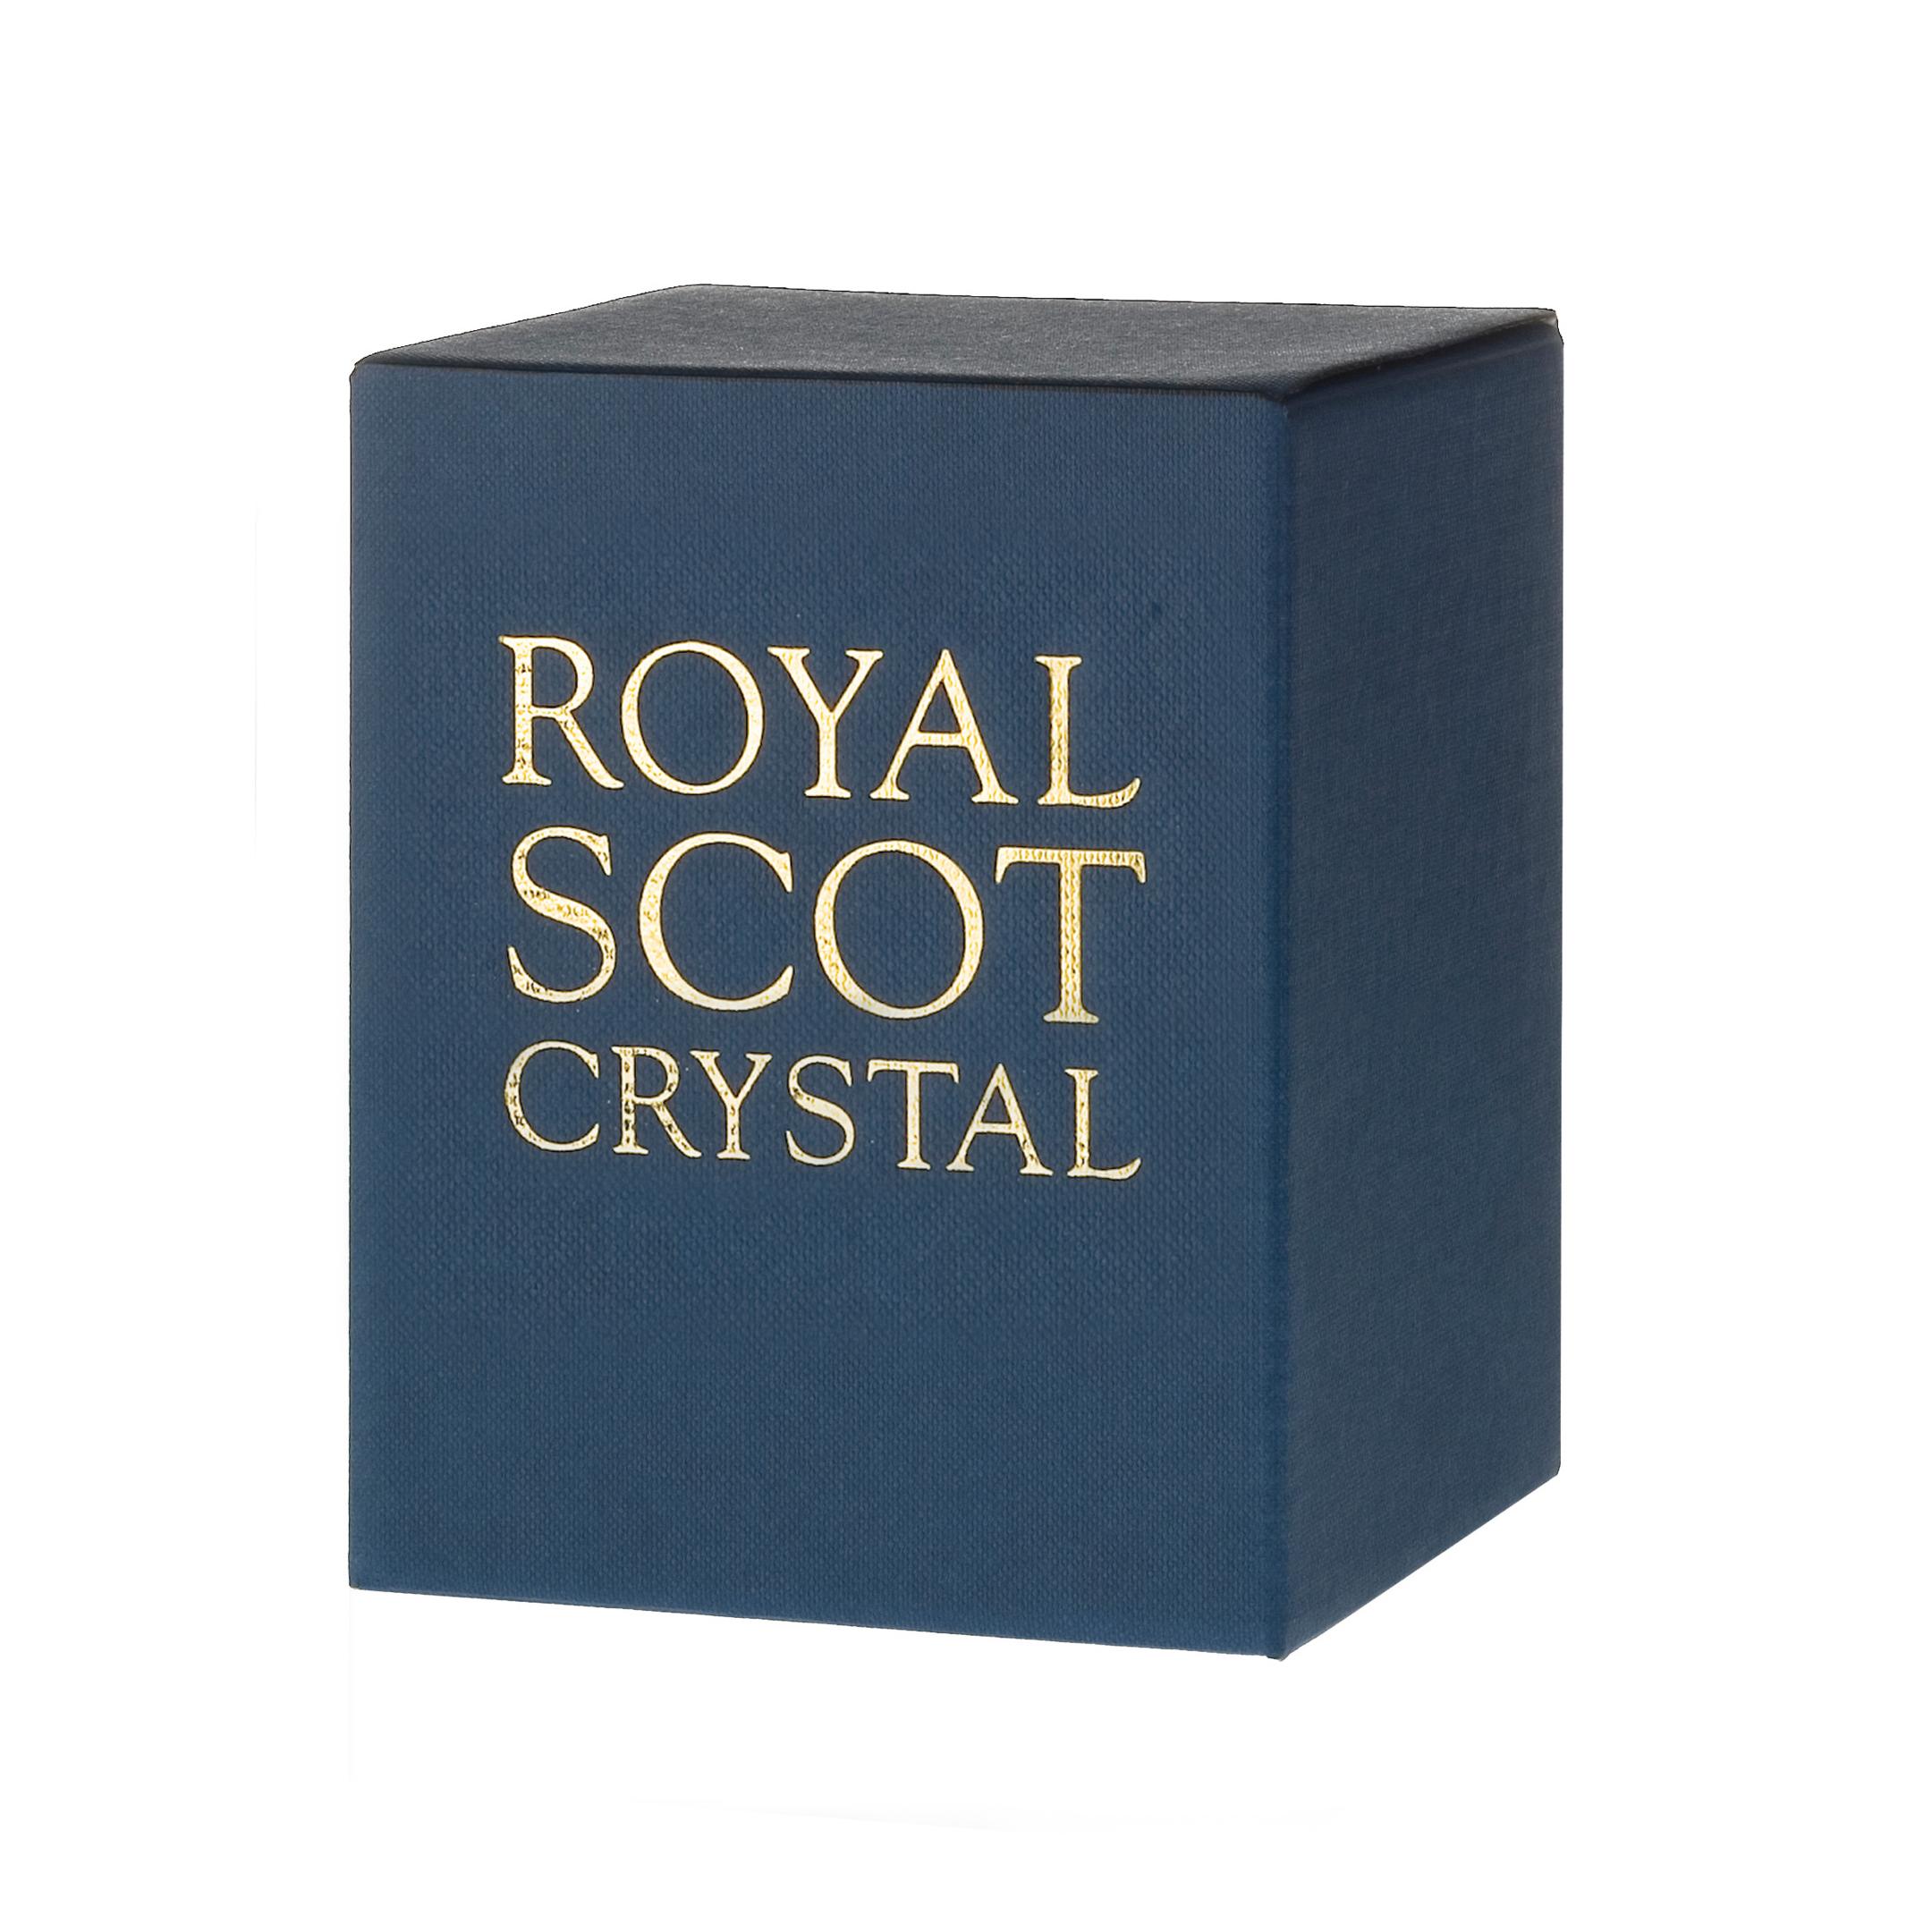 royal scot crystal product tags michael virden glass. Black Bedroom Furniture Sets. Home Design Ideas